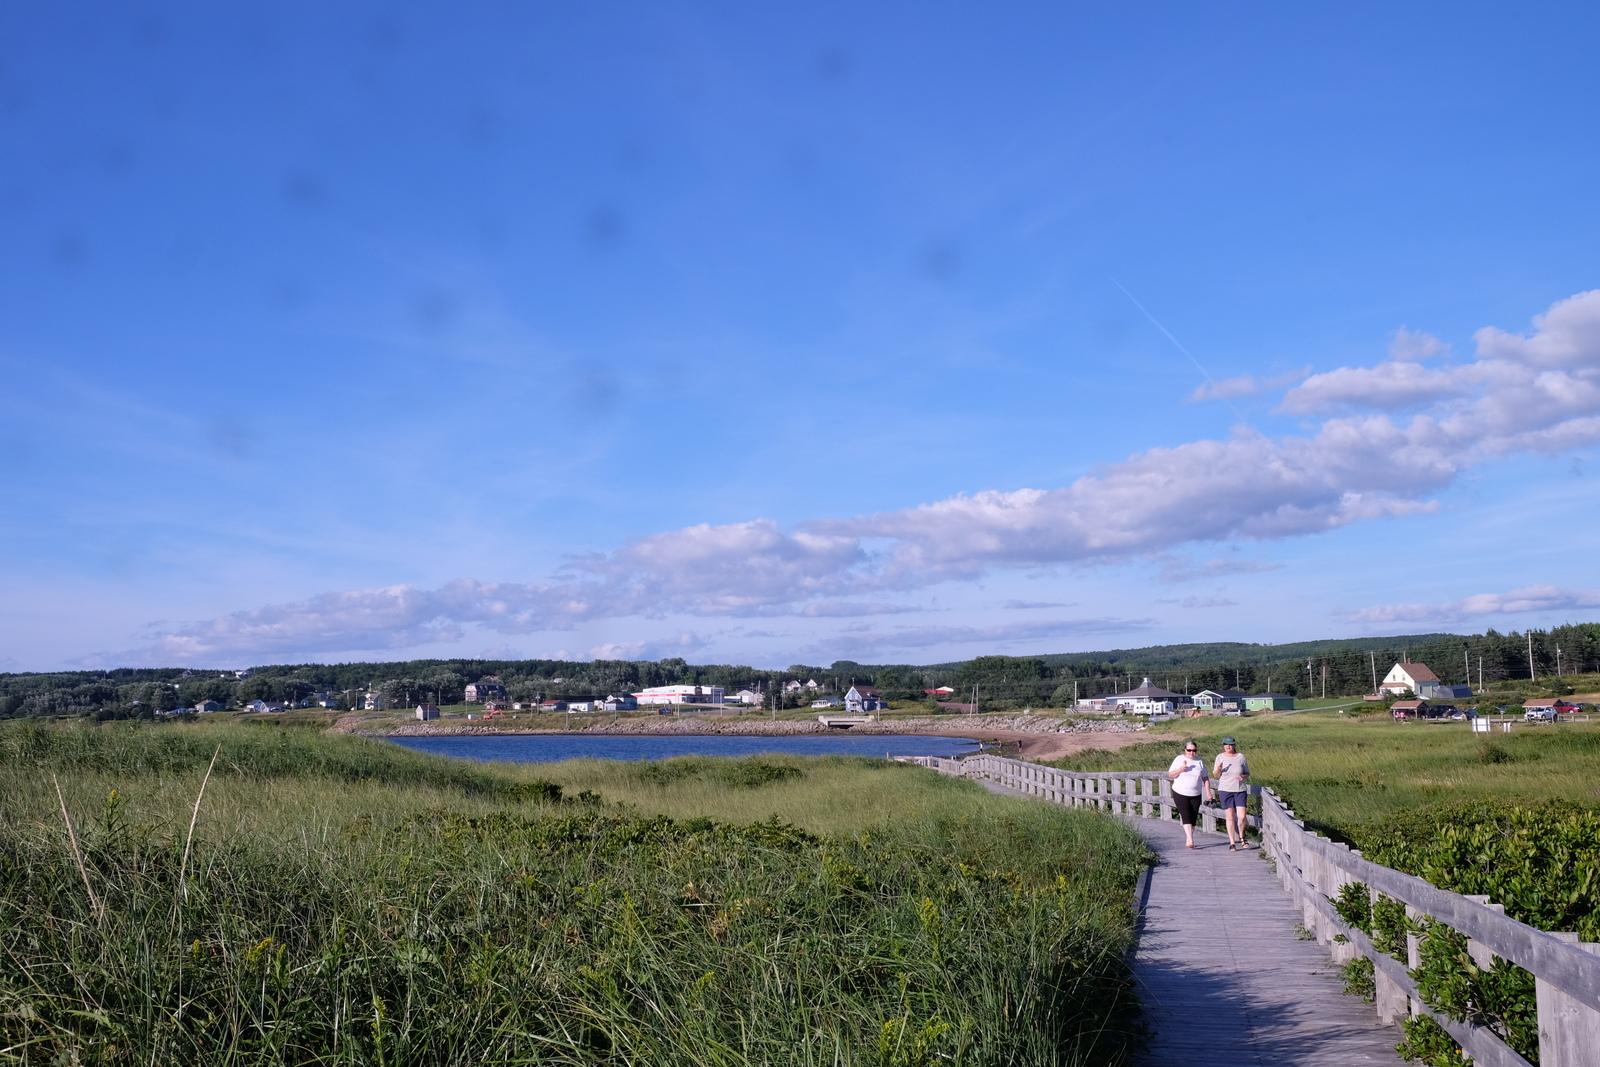 Port Hood is a lovely community in Cape Breton, Nova Scotia. - JIM BYERS PHOTO